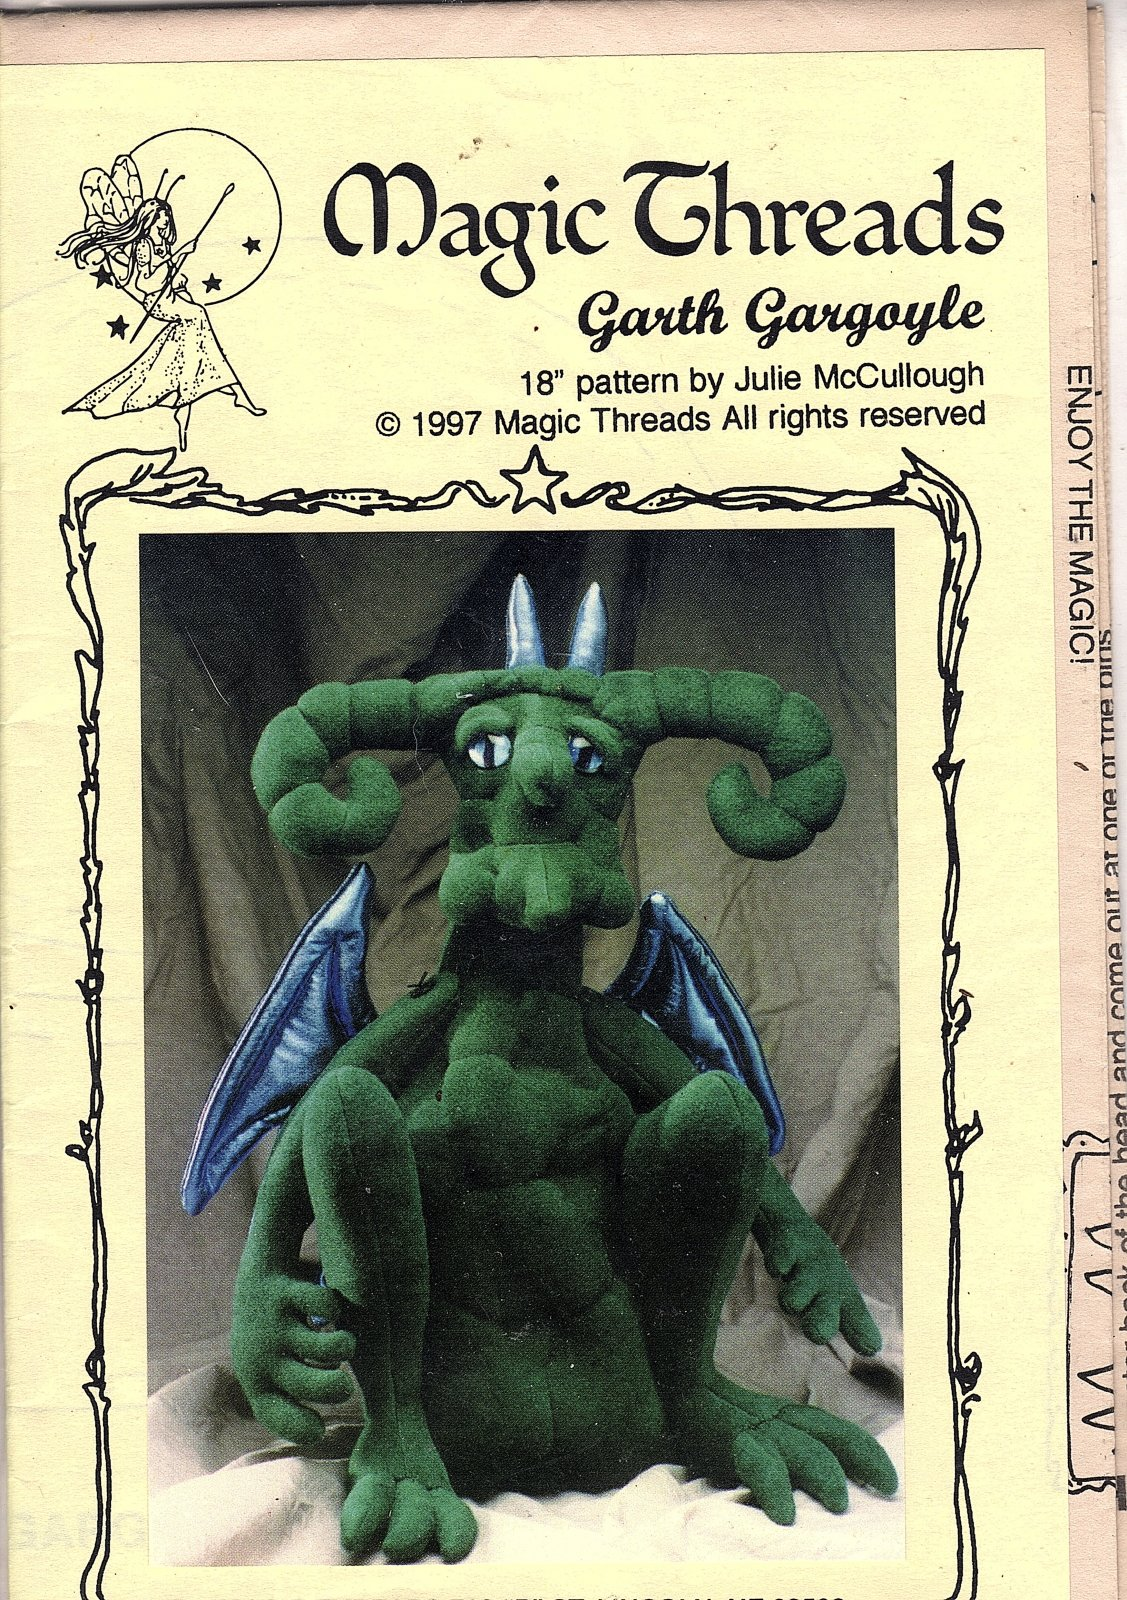 Garth Gargoyle - 18 Pattern by Julie McCullough for Magic Threads